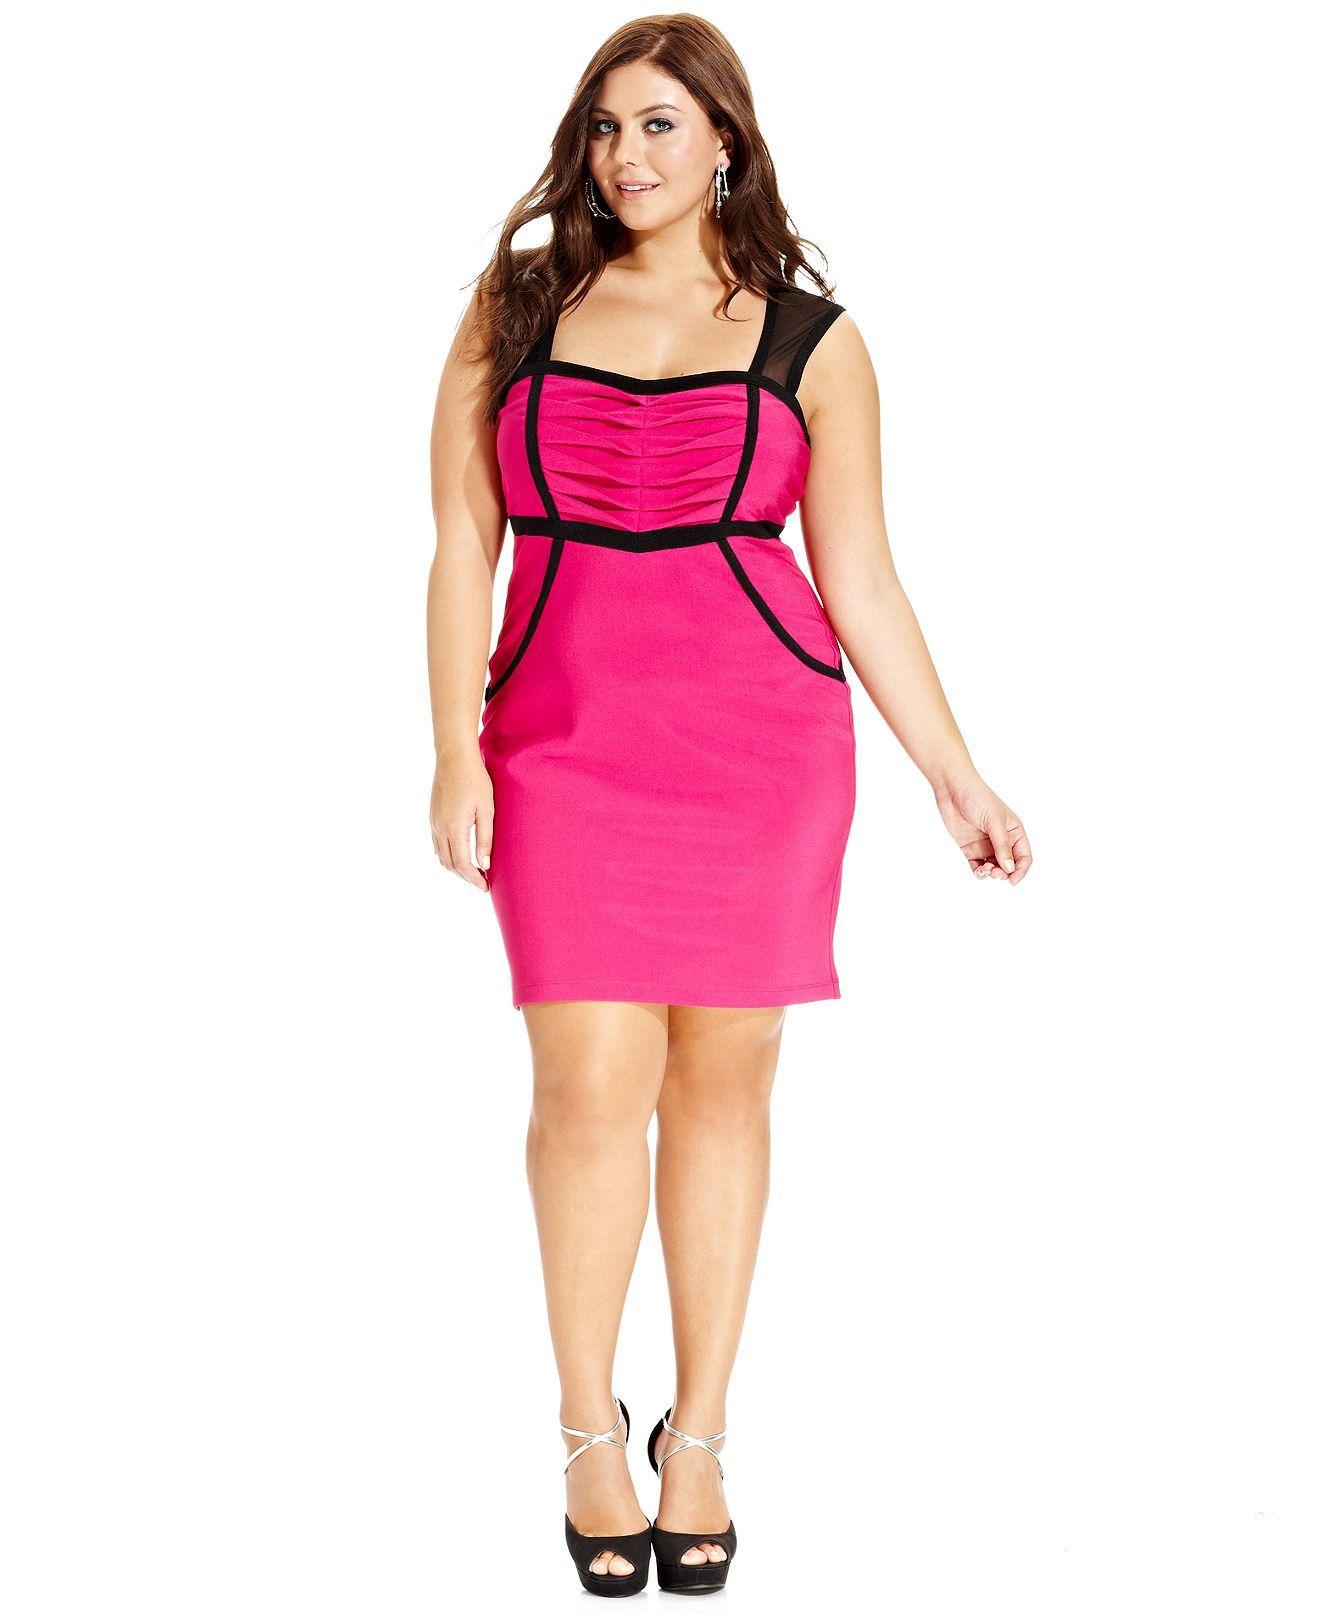 Ruby Rox Plus Size Dress, Sleeveless Cutout-Back Bodycon - Plus Size ...